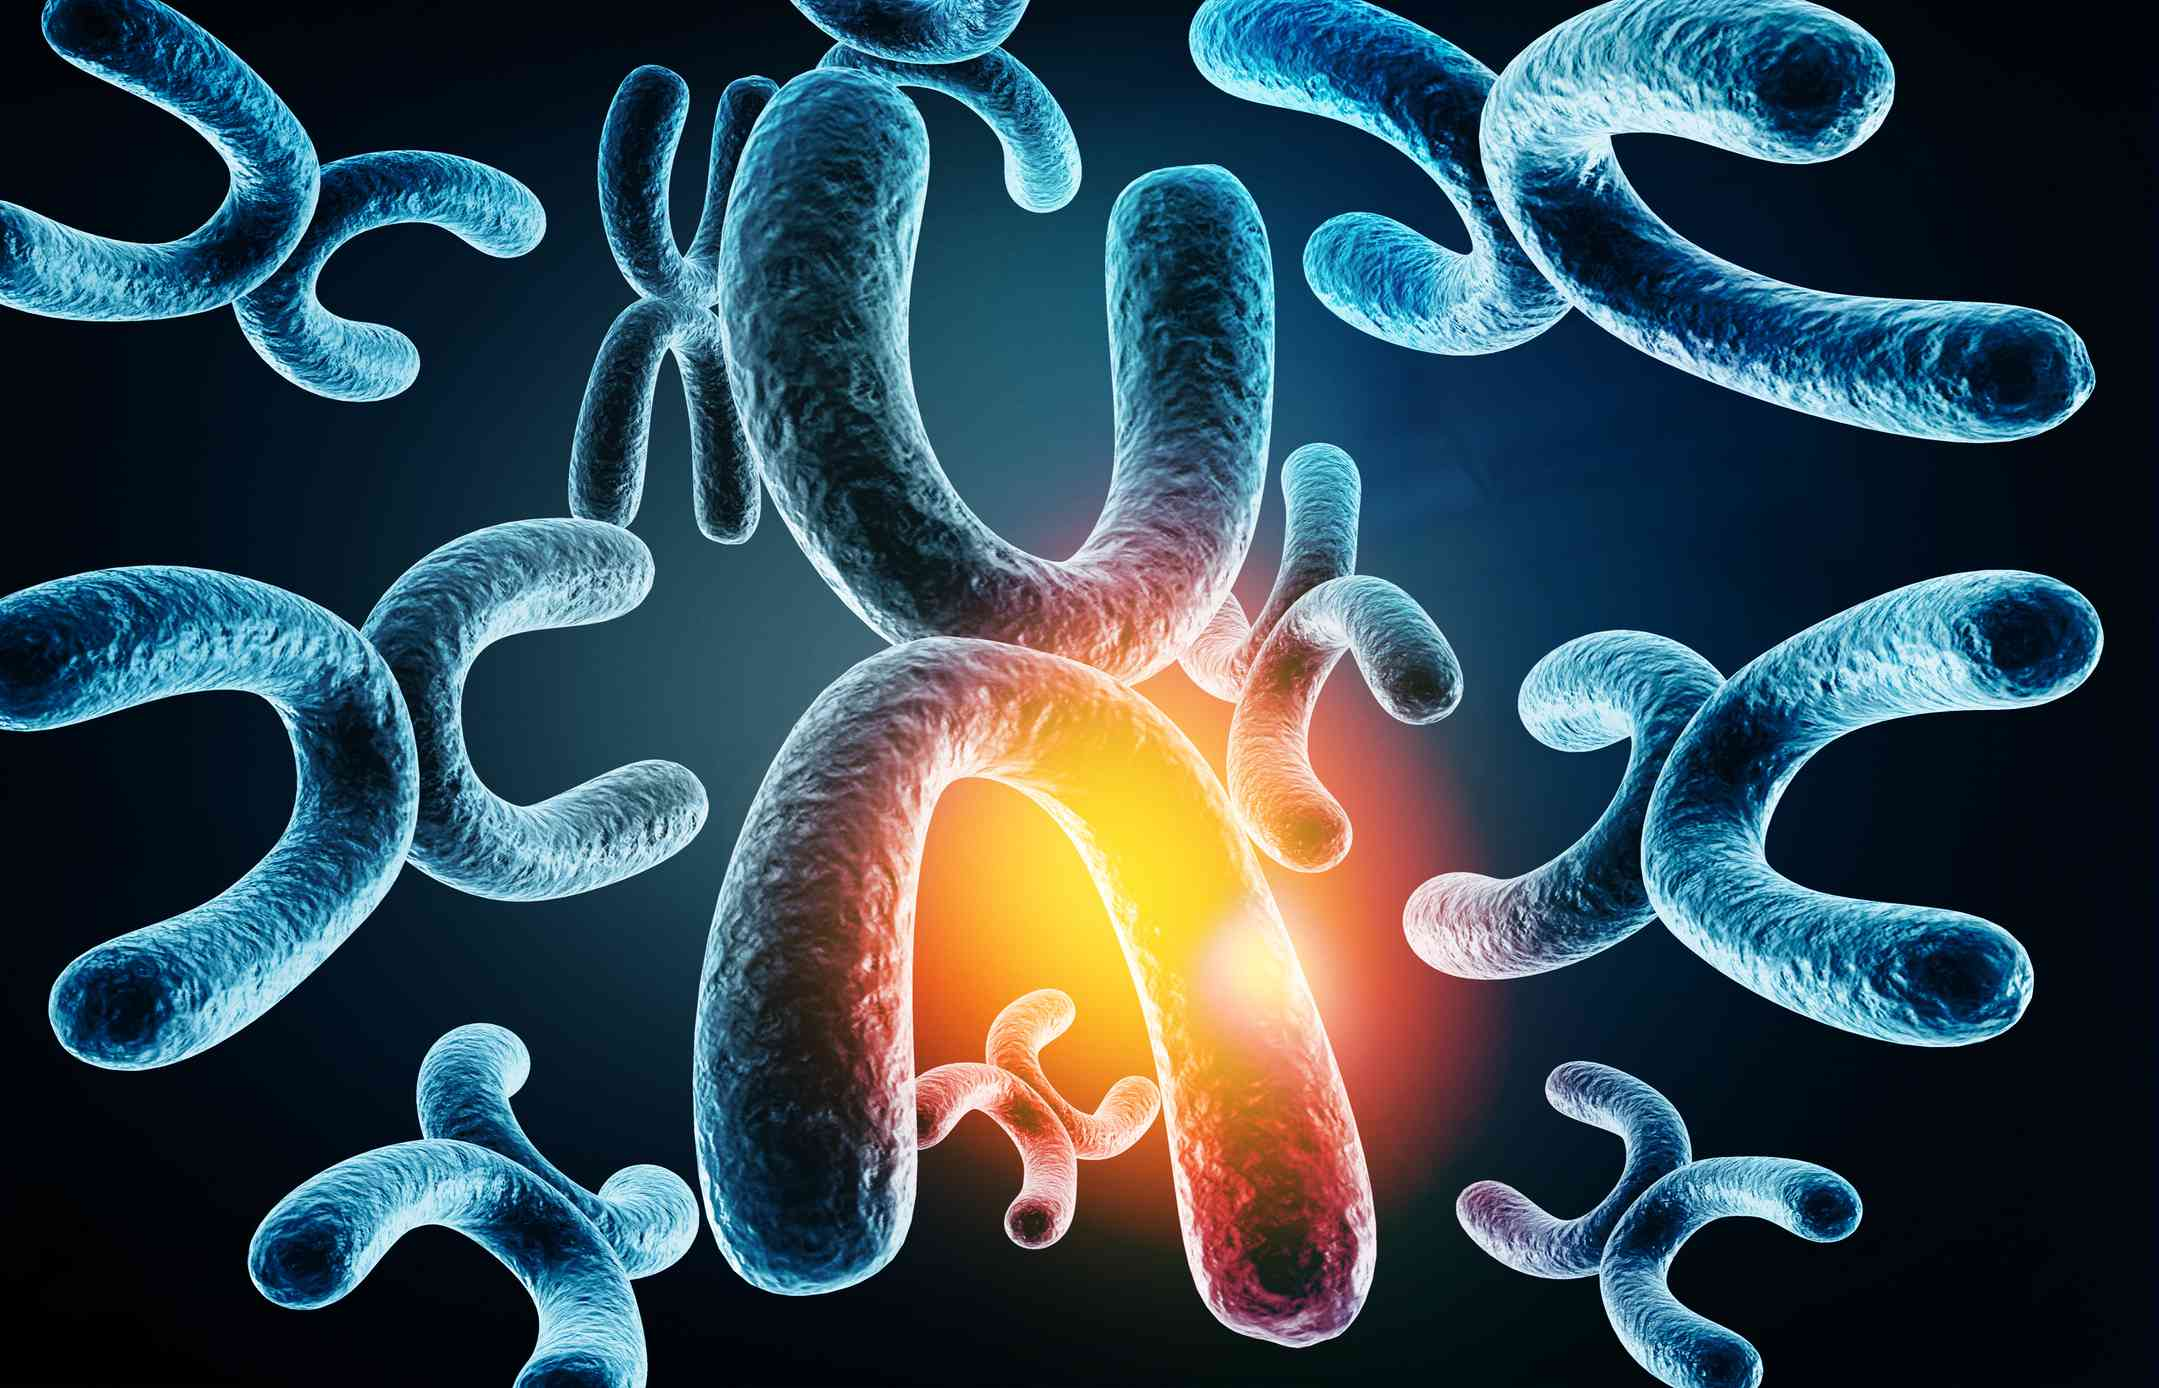 X chromosome with defective gene